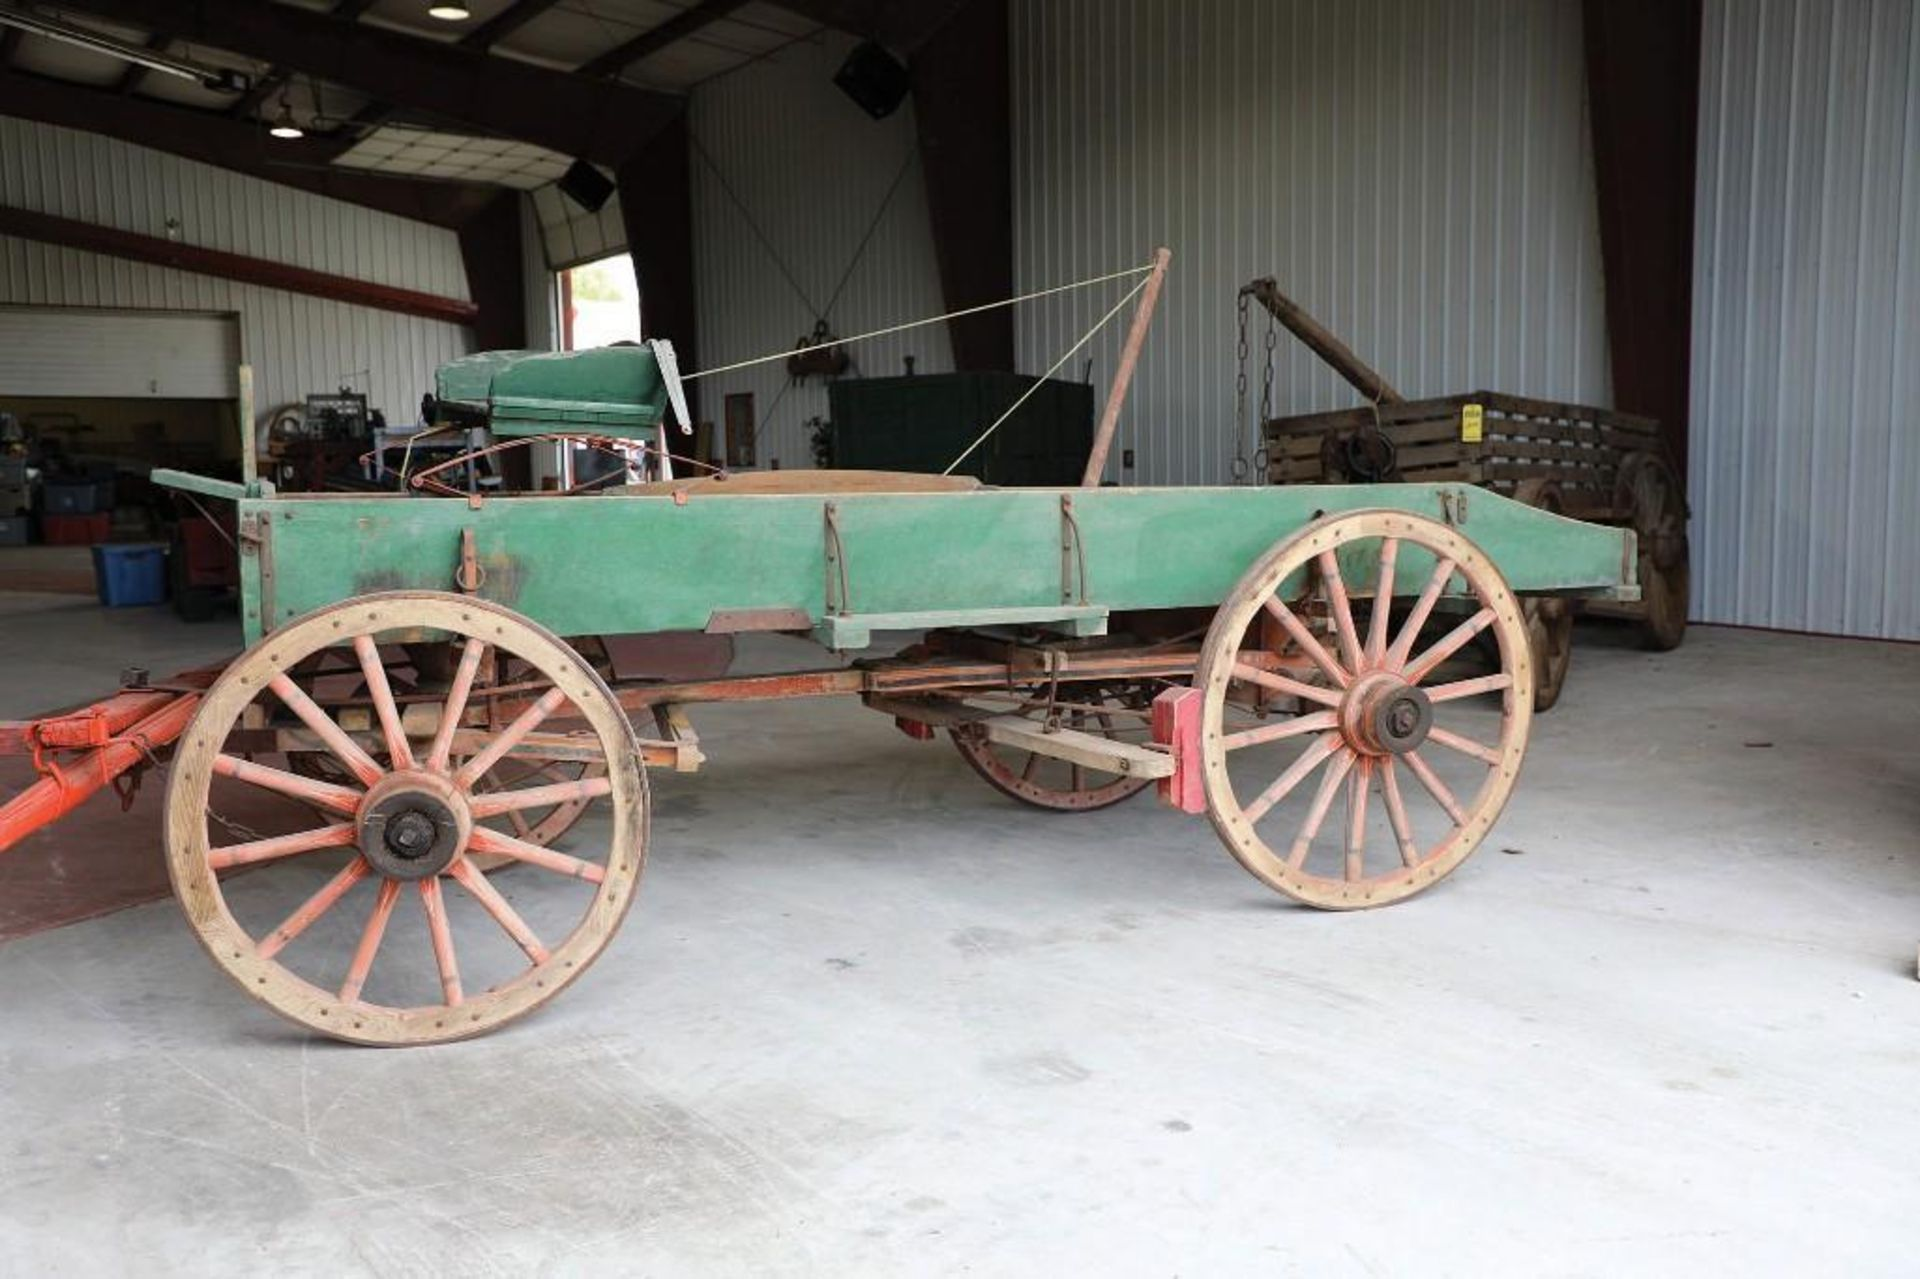 OWENSBORO Box Bed Farm Wagon - Image 2 of 2